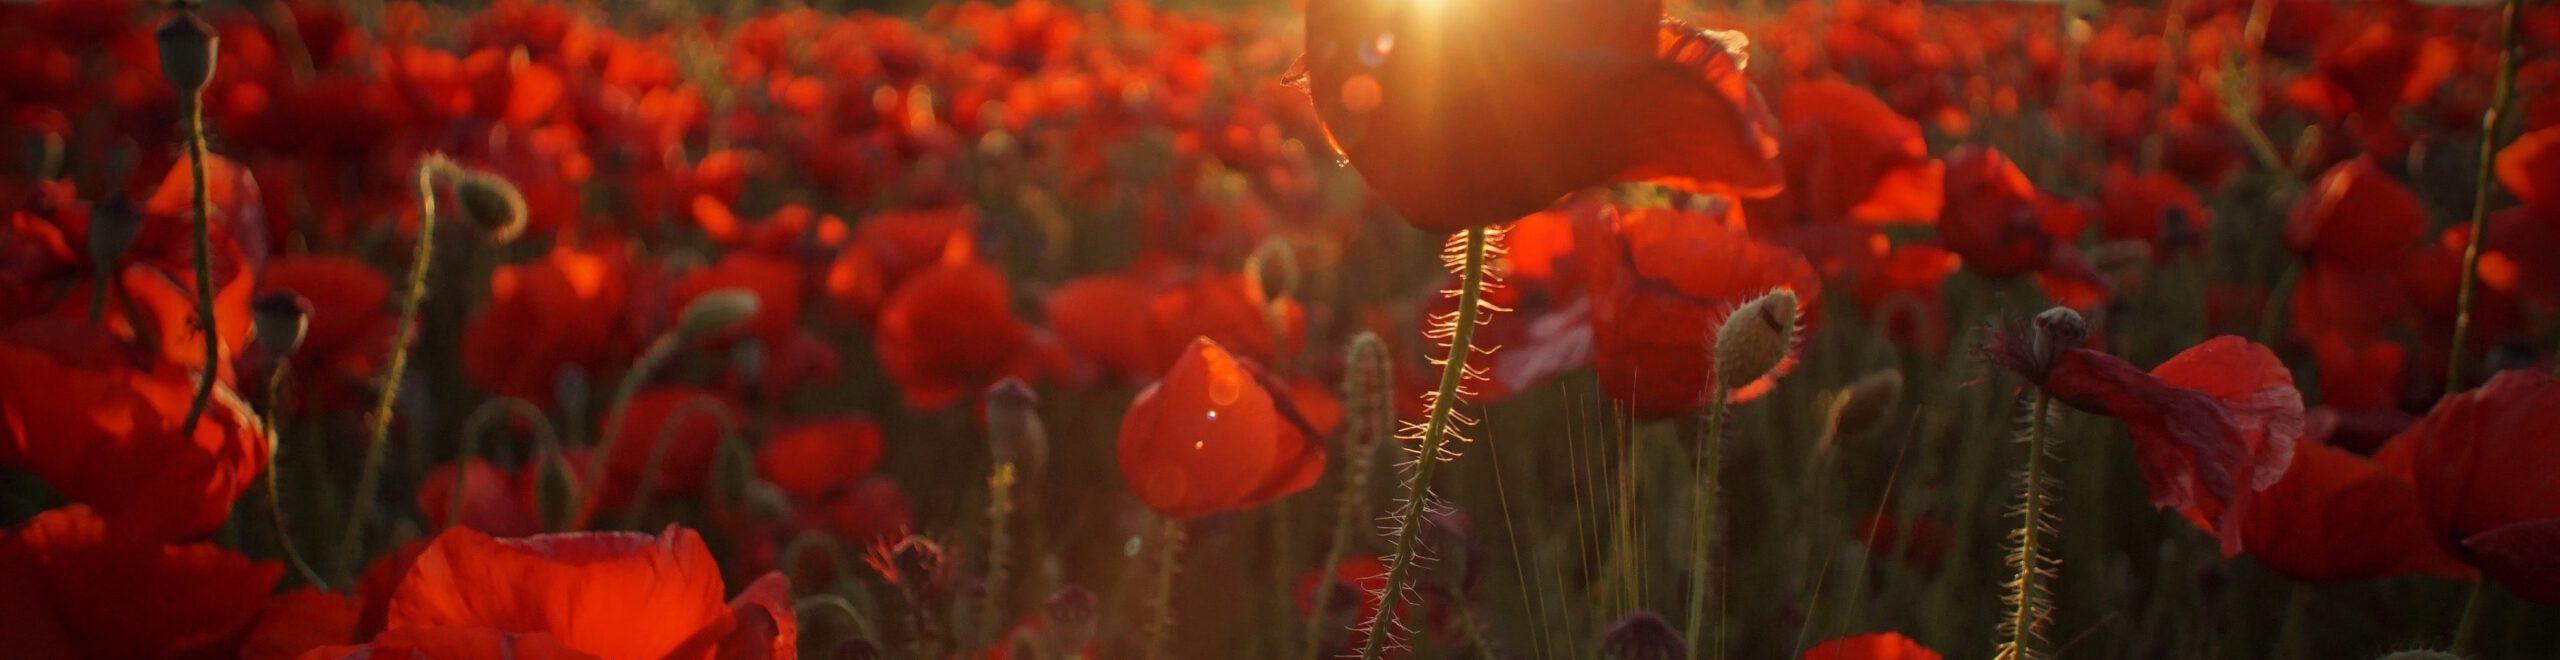 poppies blooming